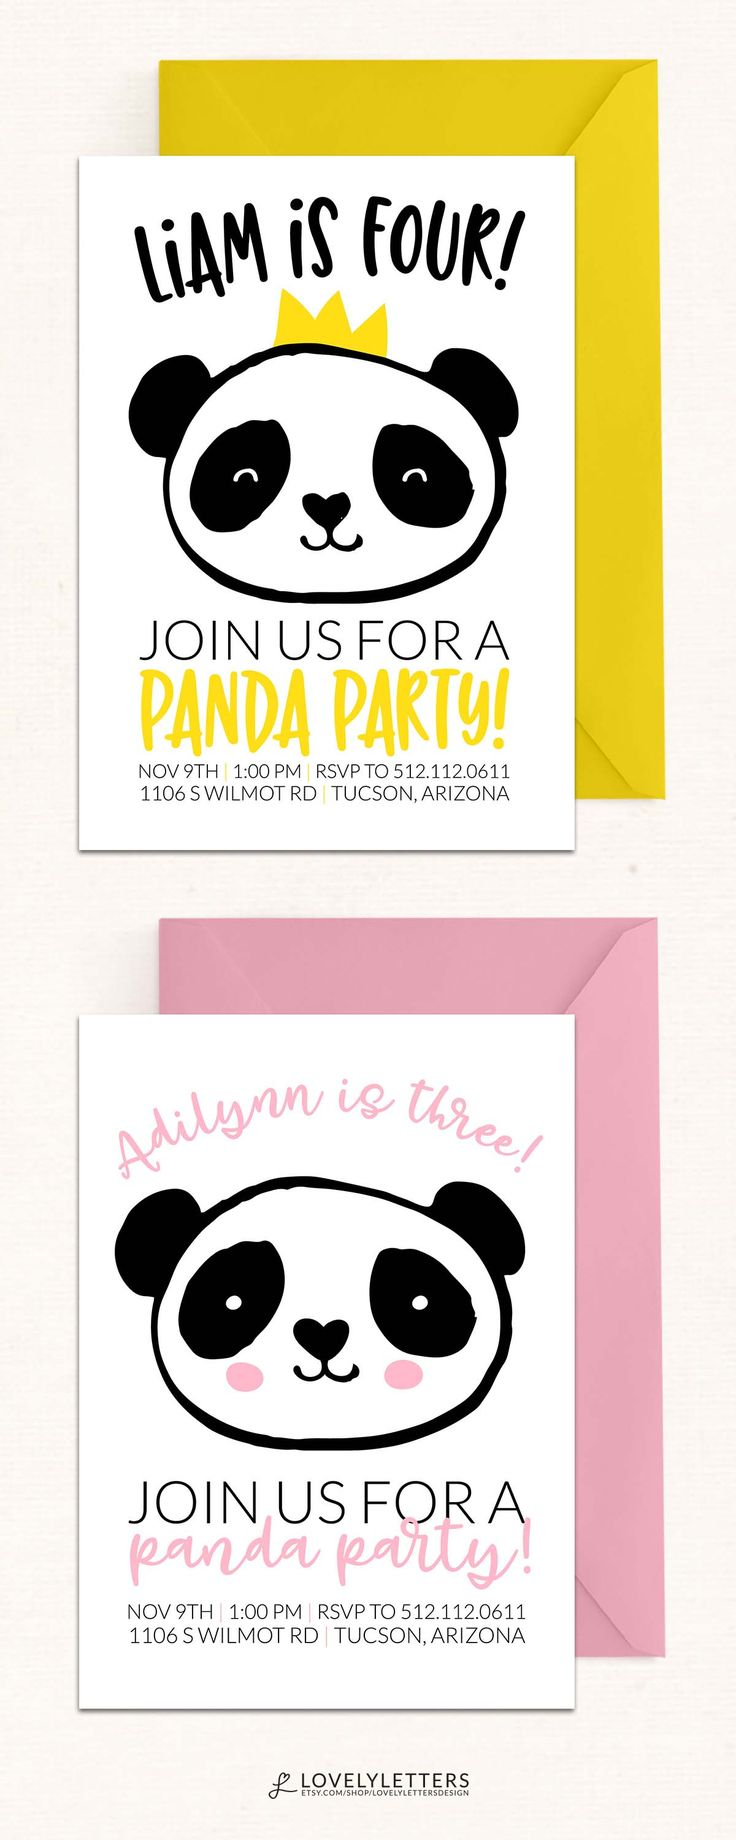 Panda Party Invitation / Panda Birthday Invitation / Panda Invite designed by Lovely Letters Design lovelylettersdesign.com